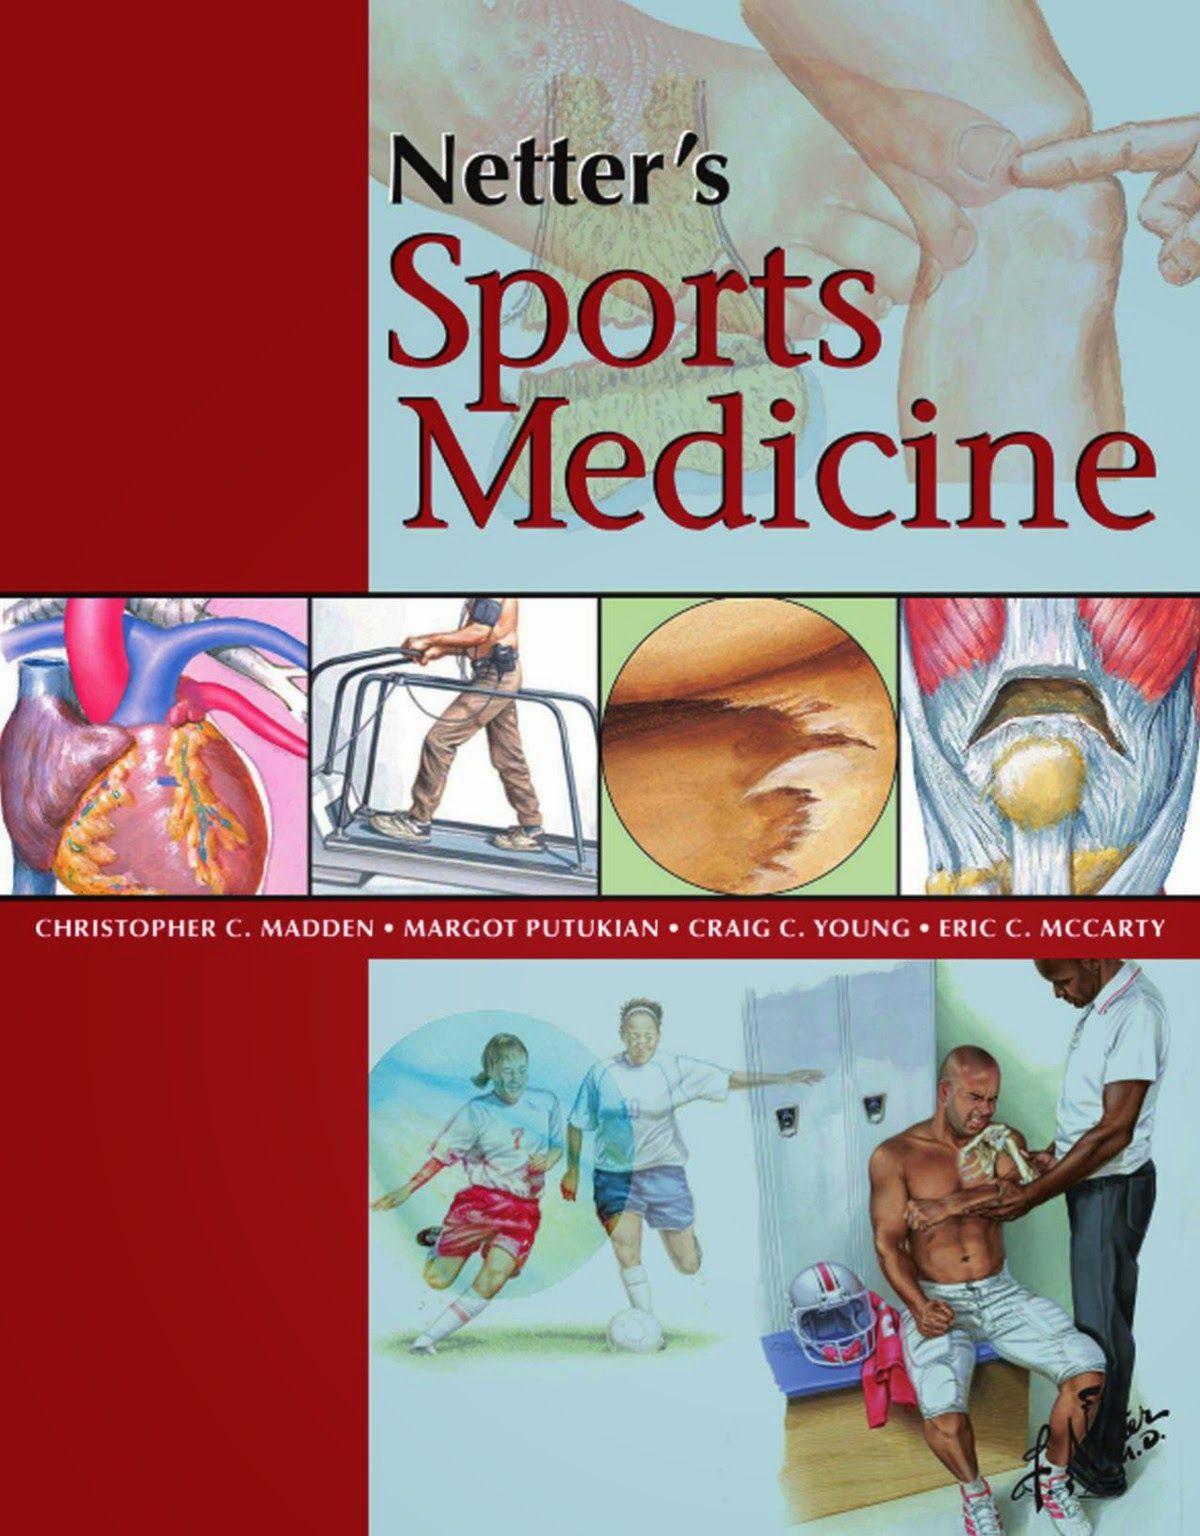 Netter\'s Sports Medicine PDF | Medicine, Pdf and Medical students